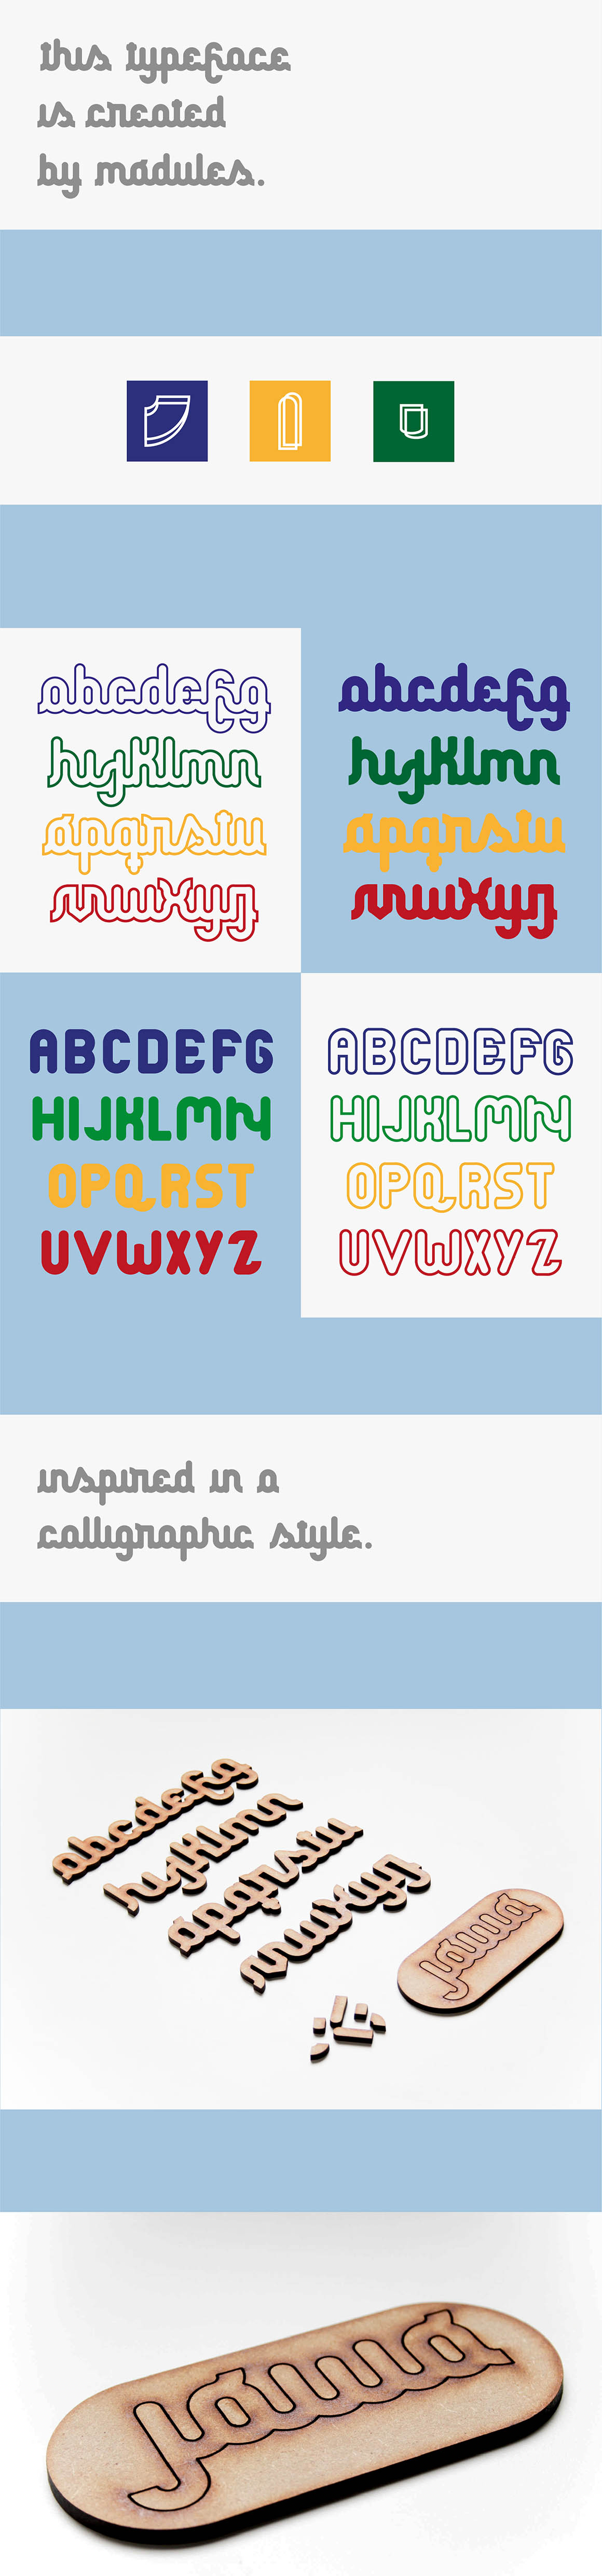 jowo-typeface-1